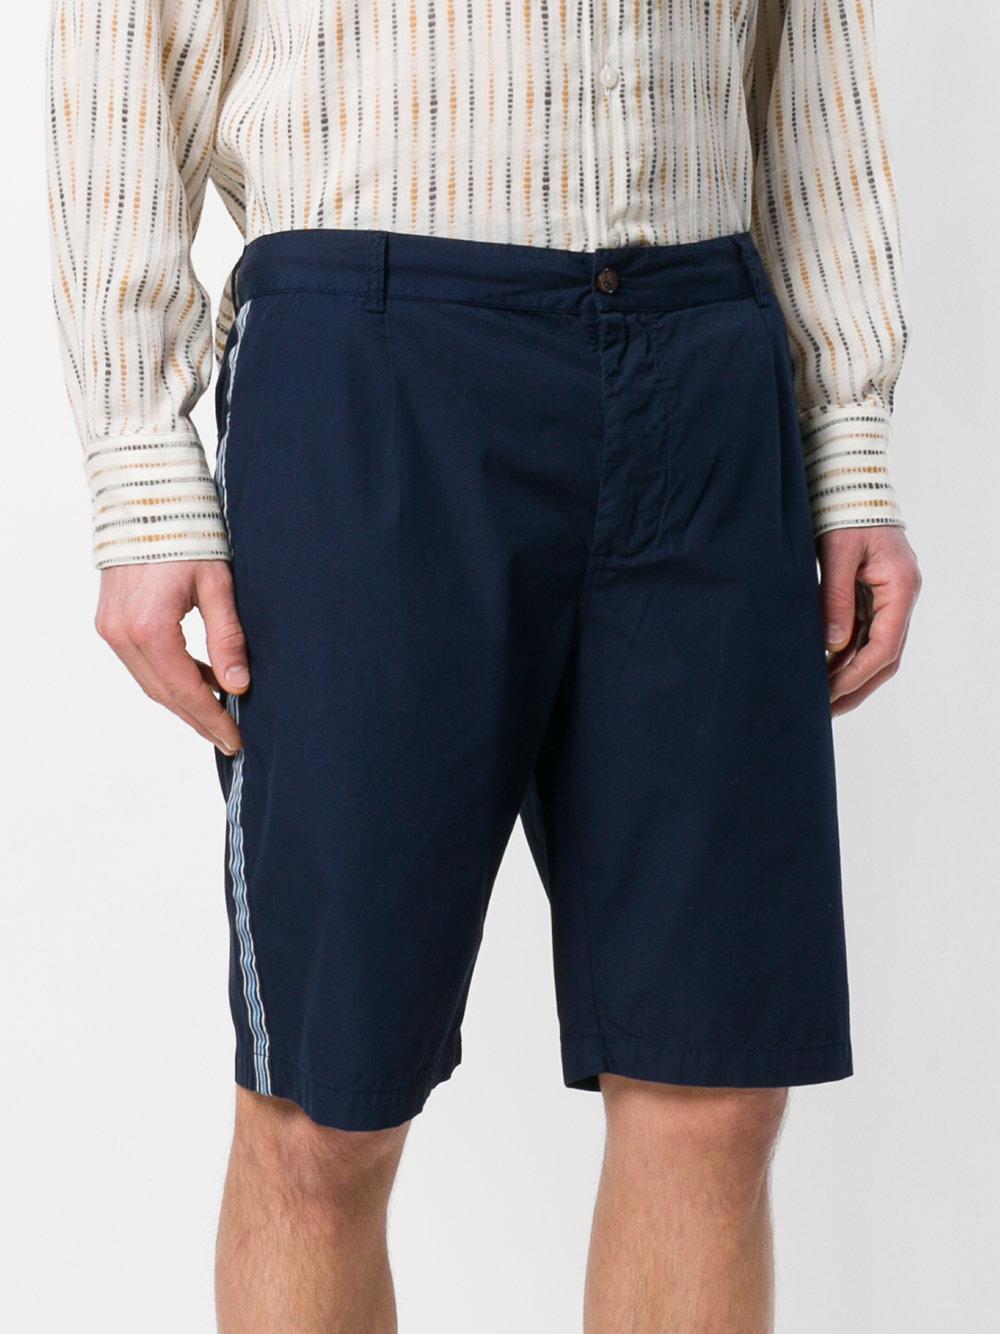 Wide-leg Panelled Indigo-dyed Cotton Shorts Universal Works 9iQwTzth